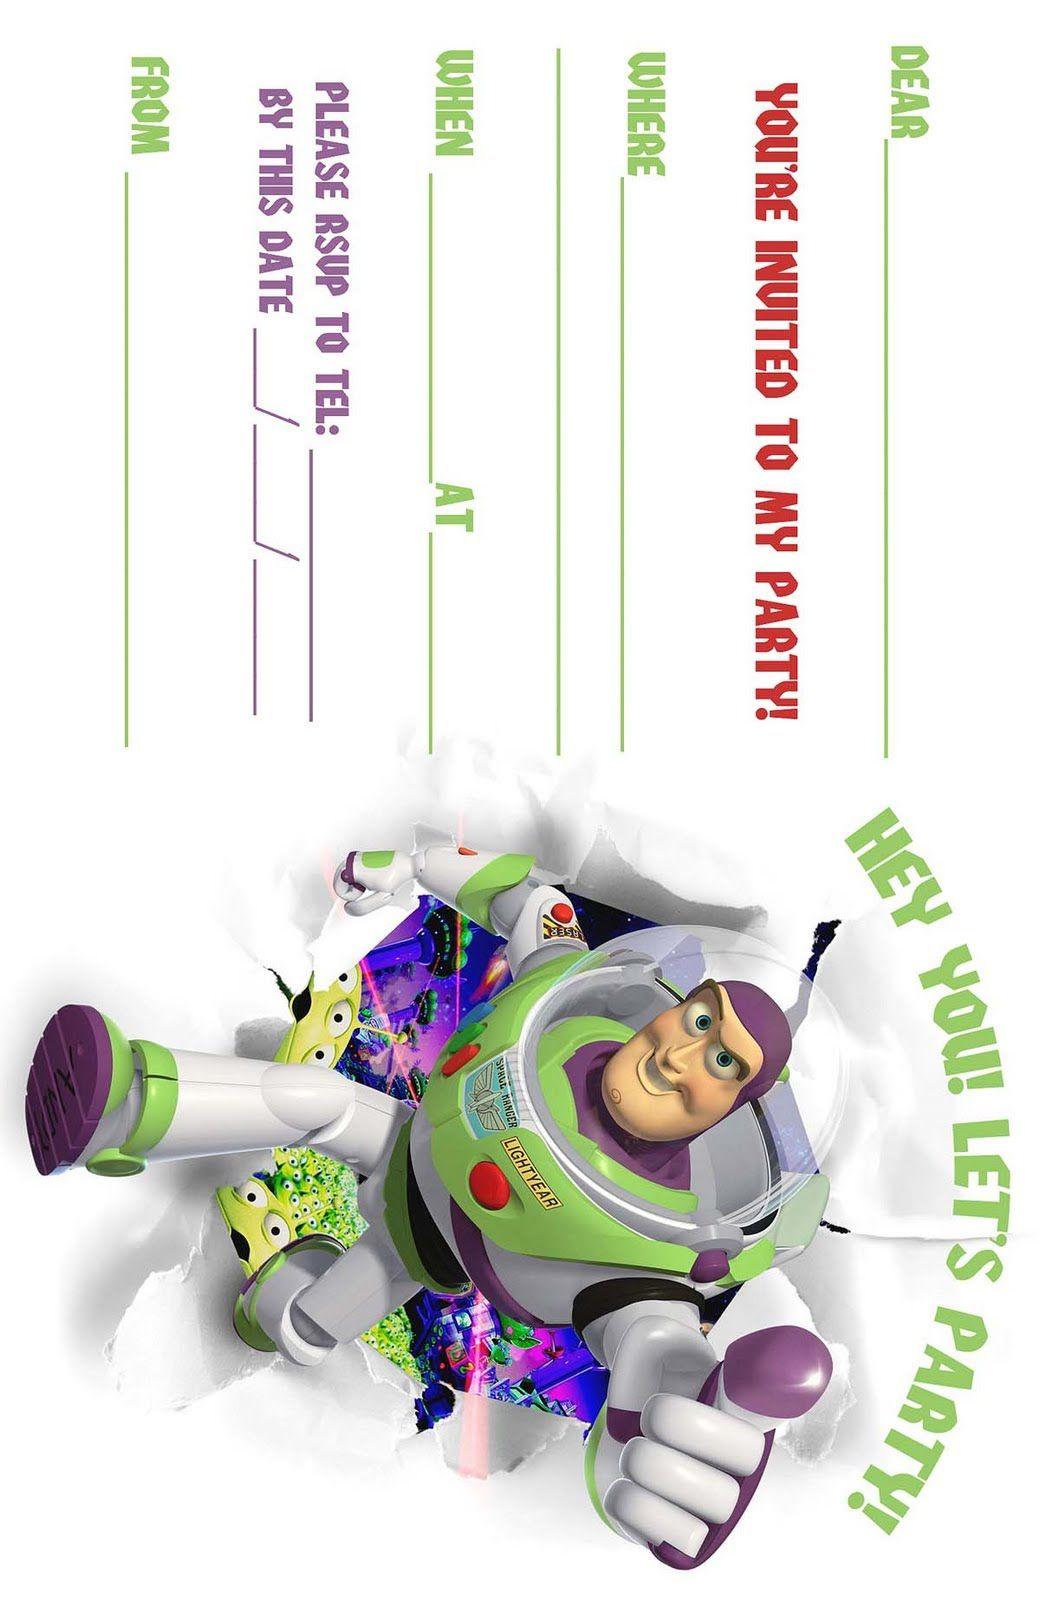 Free Buzz Lightyear Invitations Toy Story Invitations Buzz Lightyear Party Toy Story Party